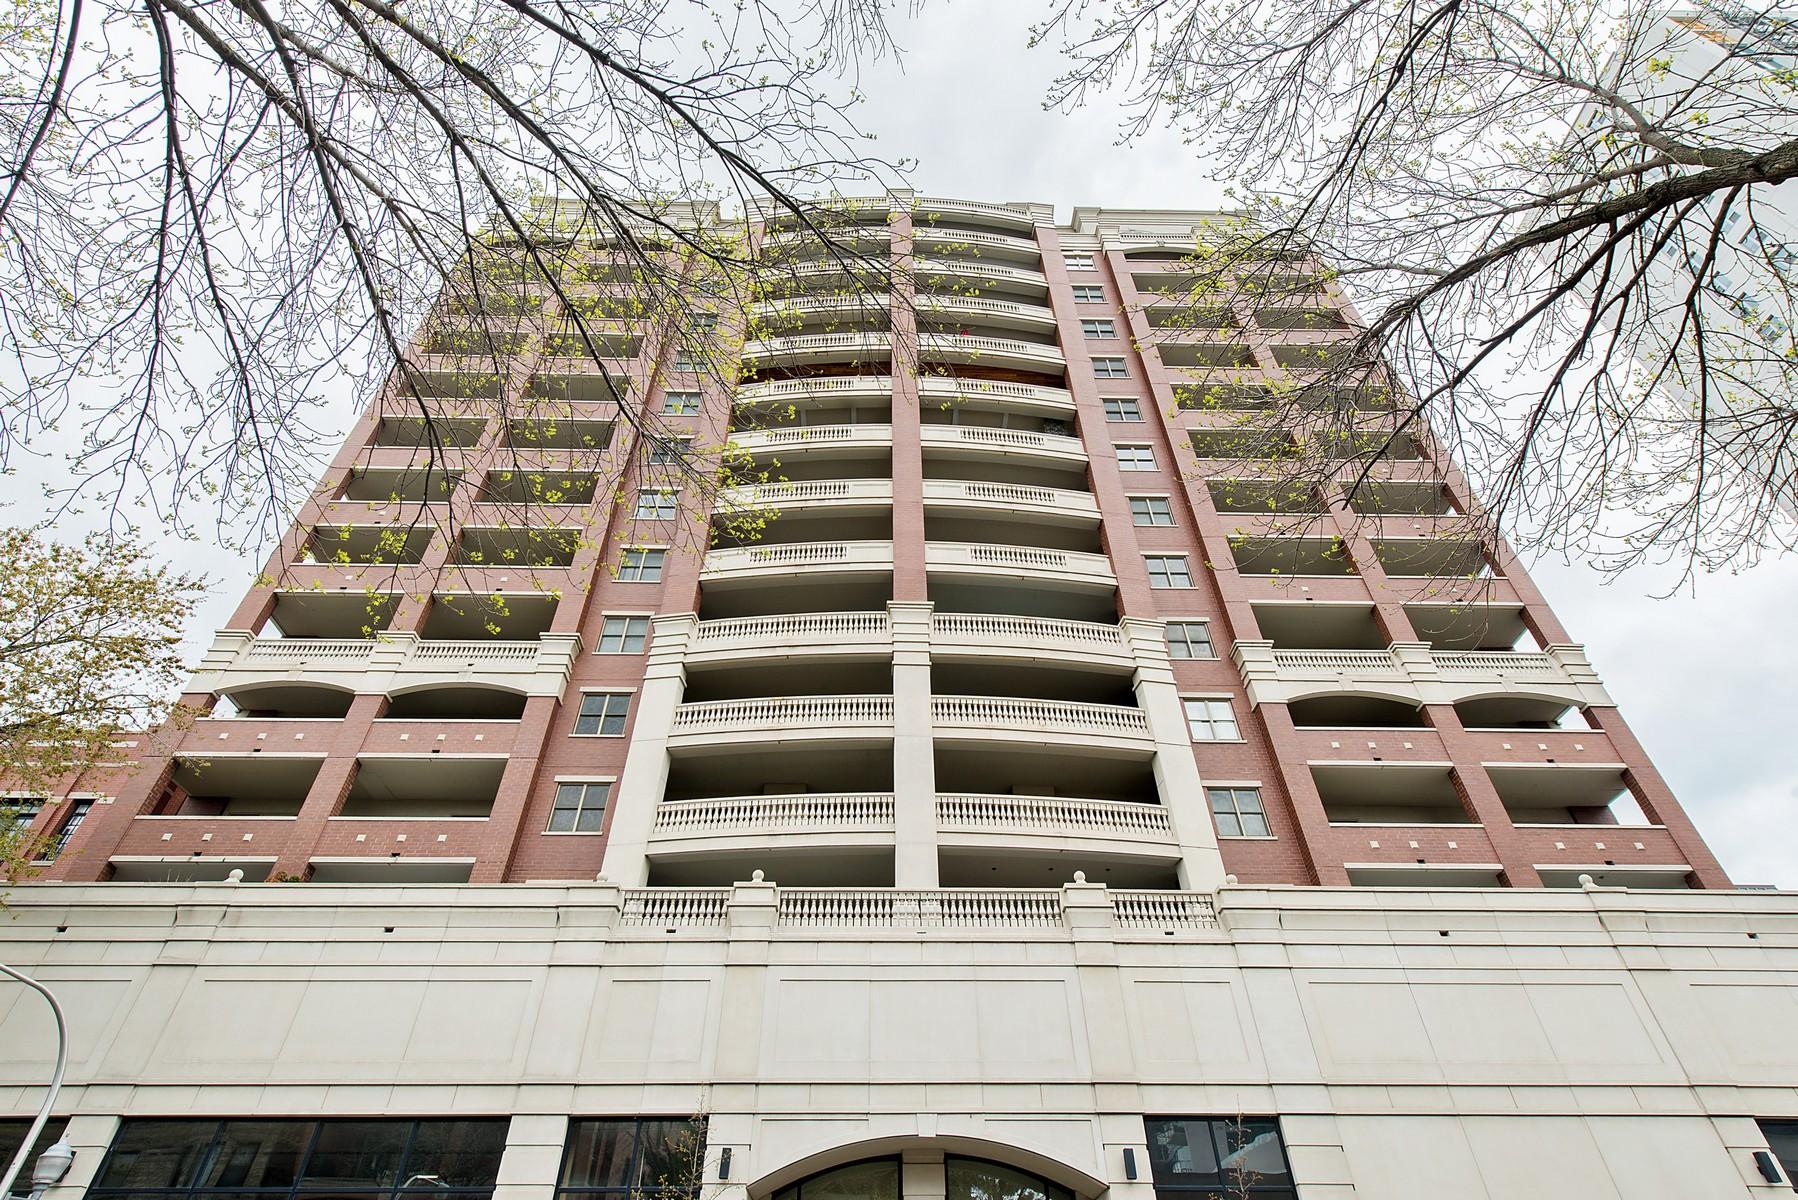 Tek Ailelik Ev için Satış at Corner Unit in Lakeview Boutique Building 828 W Grace Street Unit 804 Lakeview, Chicago, Illinois, 60613 Amerika Birleşik Devletleri